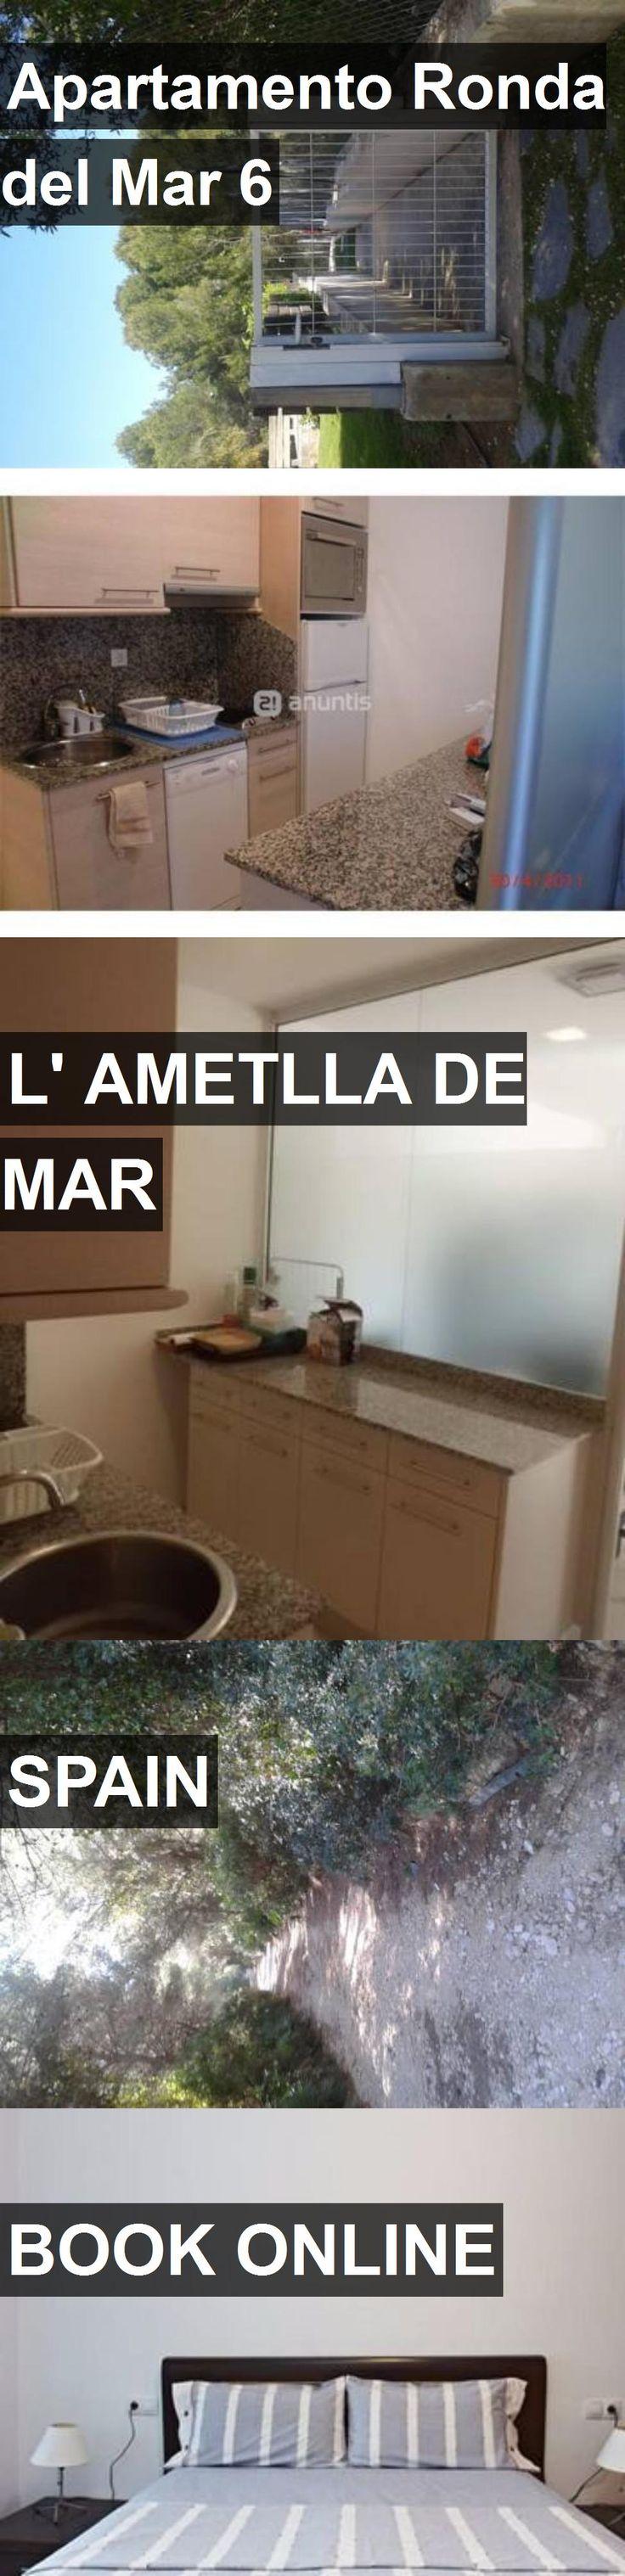 Hotel Apartamento Ronda del Mar 6 in l' Ametlla de Mar, Spain. For more information, photos, reviews and best prices please follow the link. #Spain #l'AmetlladeMar #travel #vacation #hotel